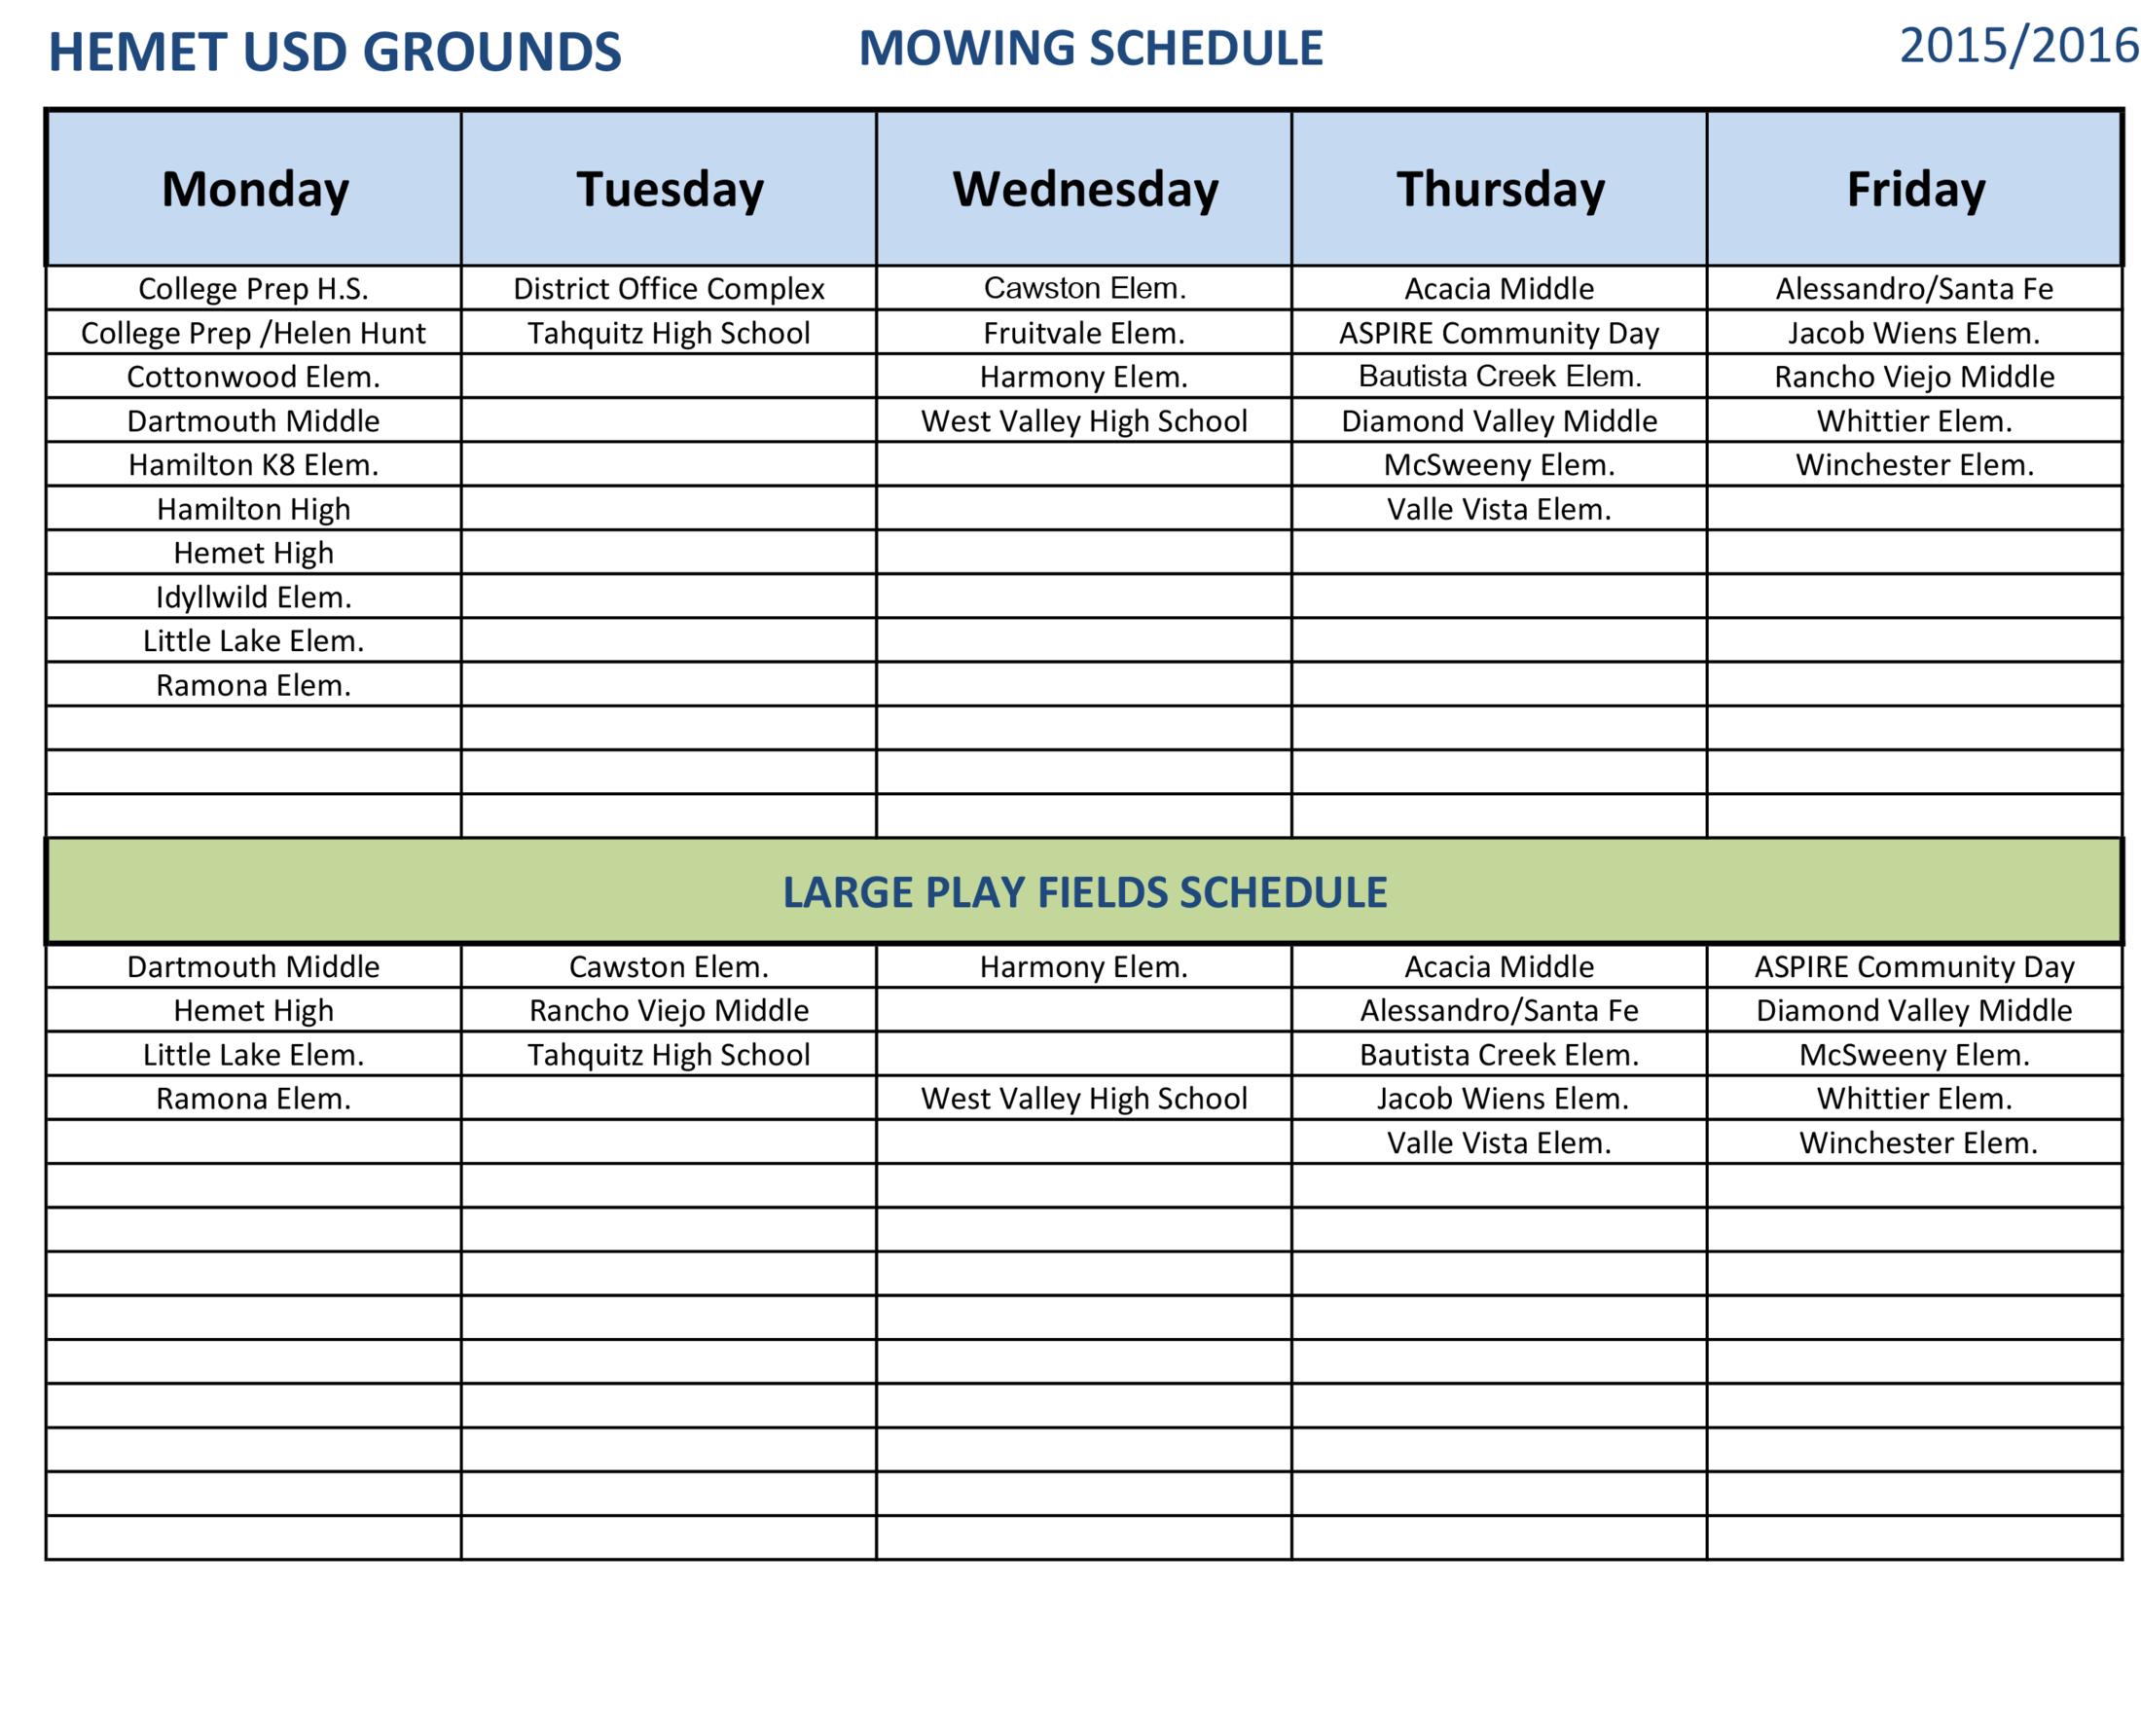 Mowing Schedule